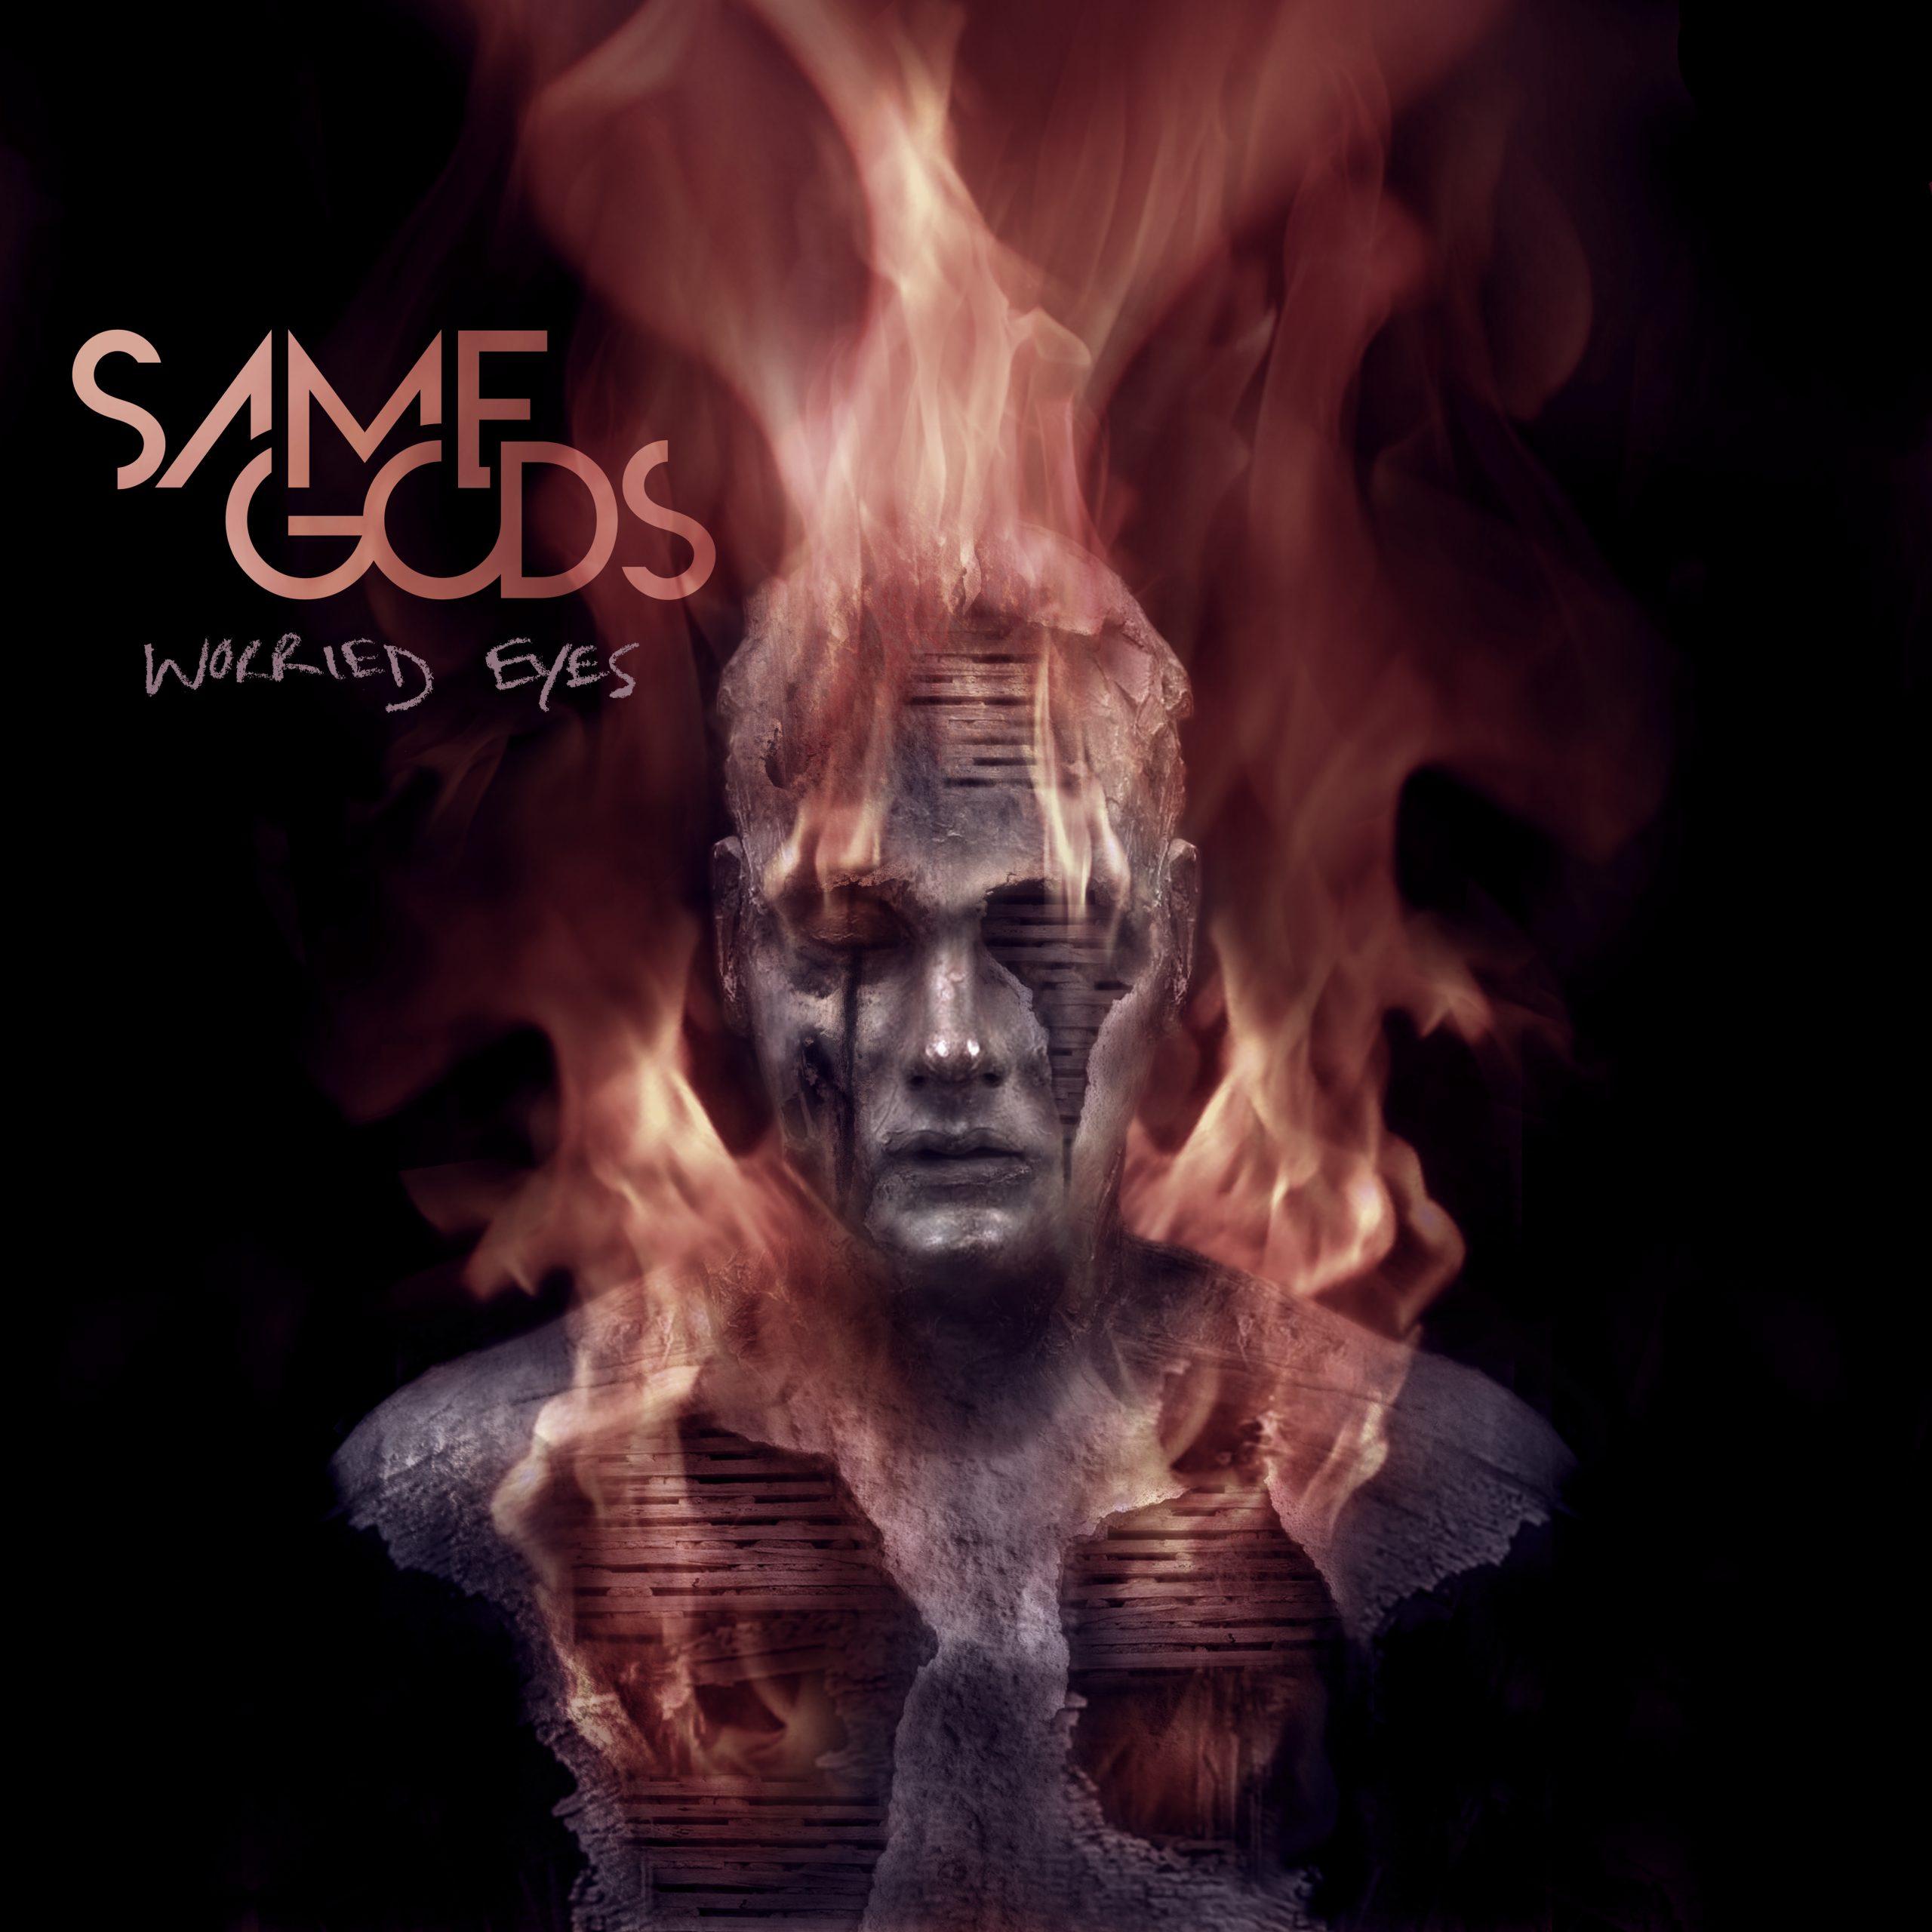 Same-Gods-Worried-Eyes-Front-Cover-300dpi-scaled.jpg